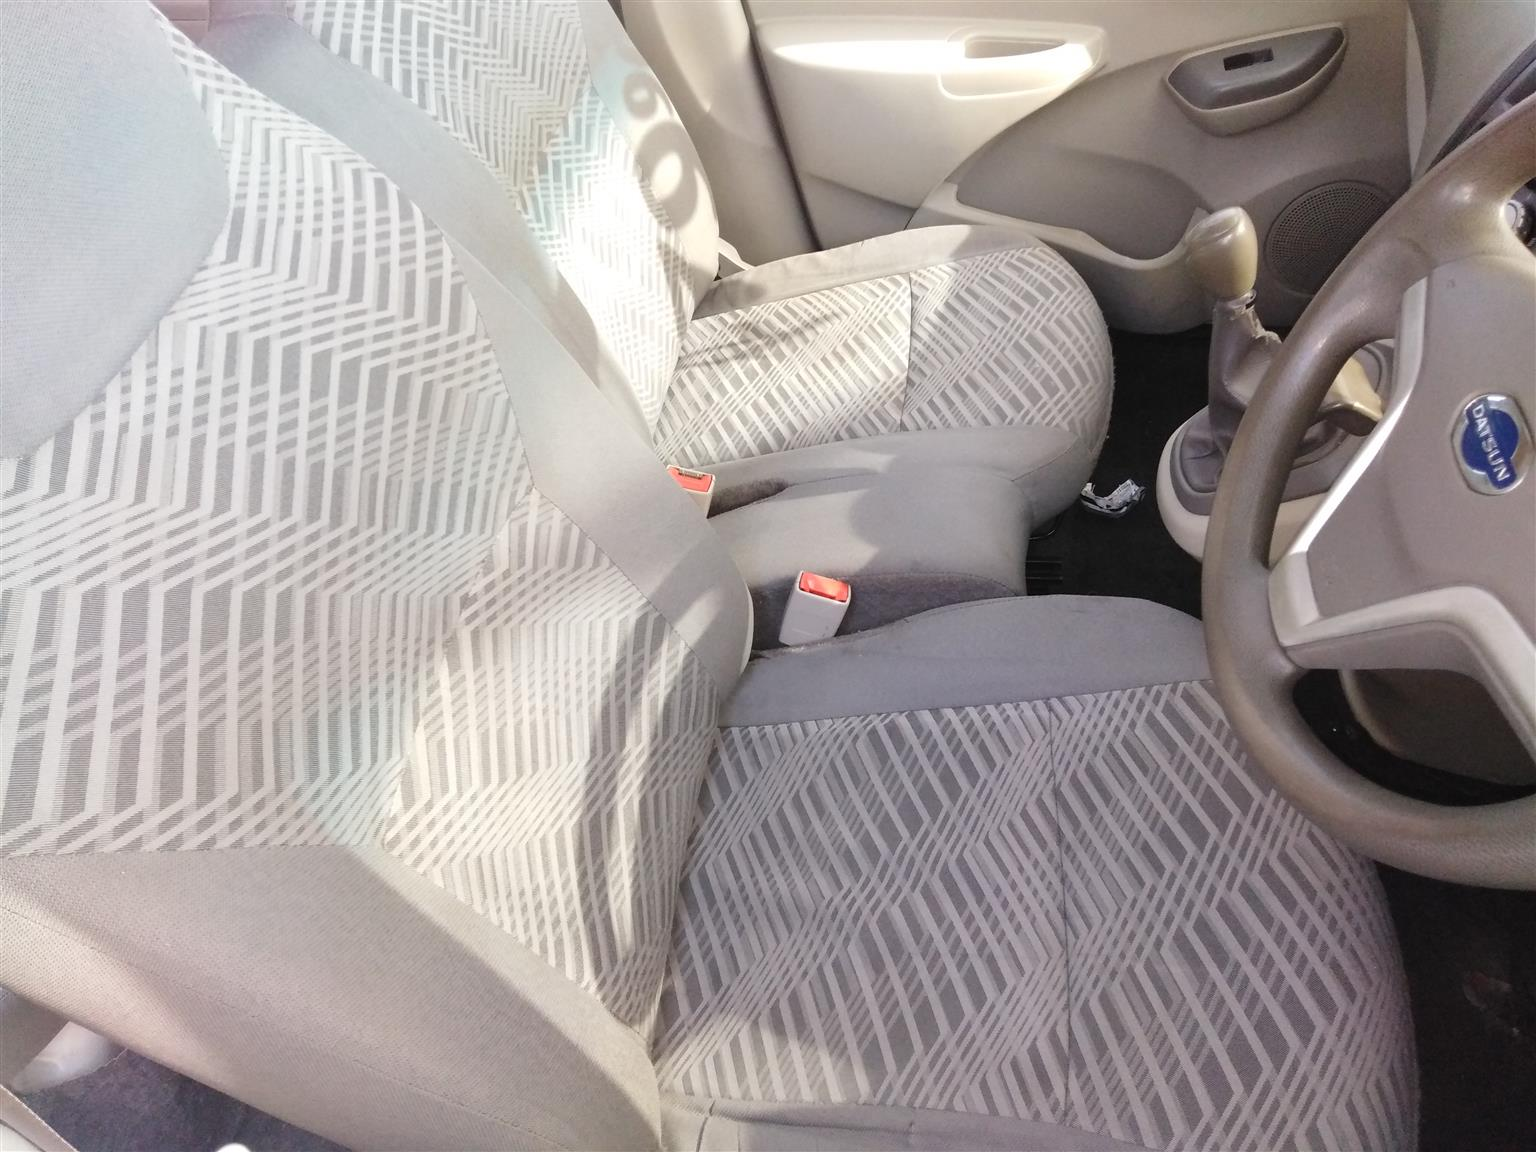 2016 Datsun Go hatch GO 1.2 MID